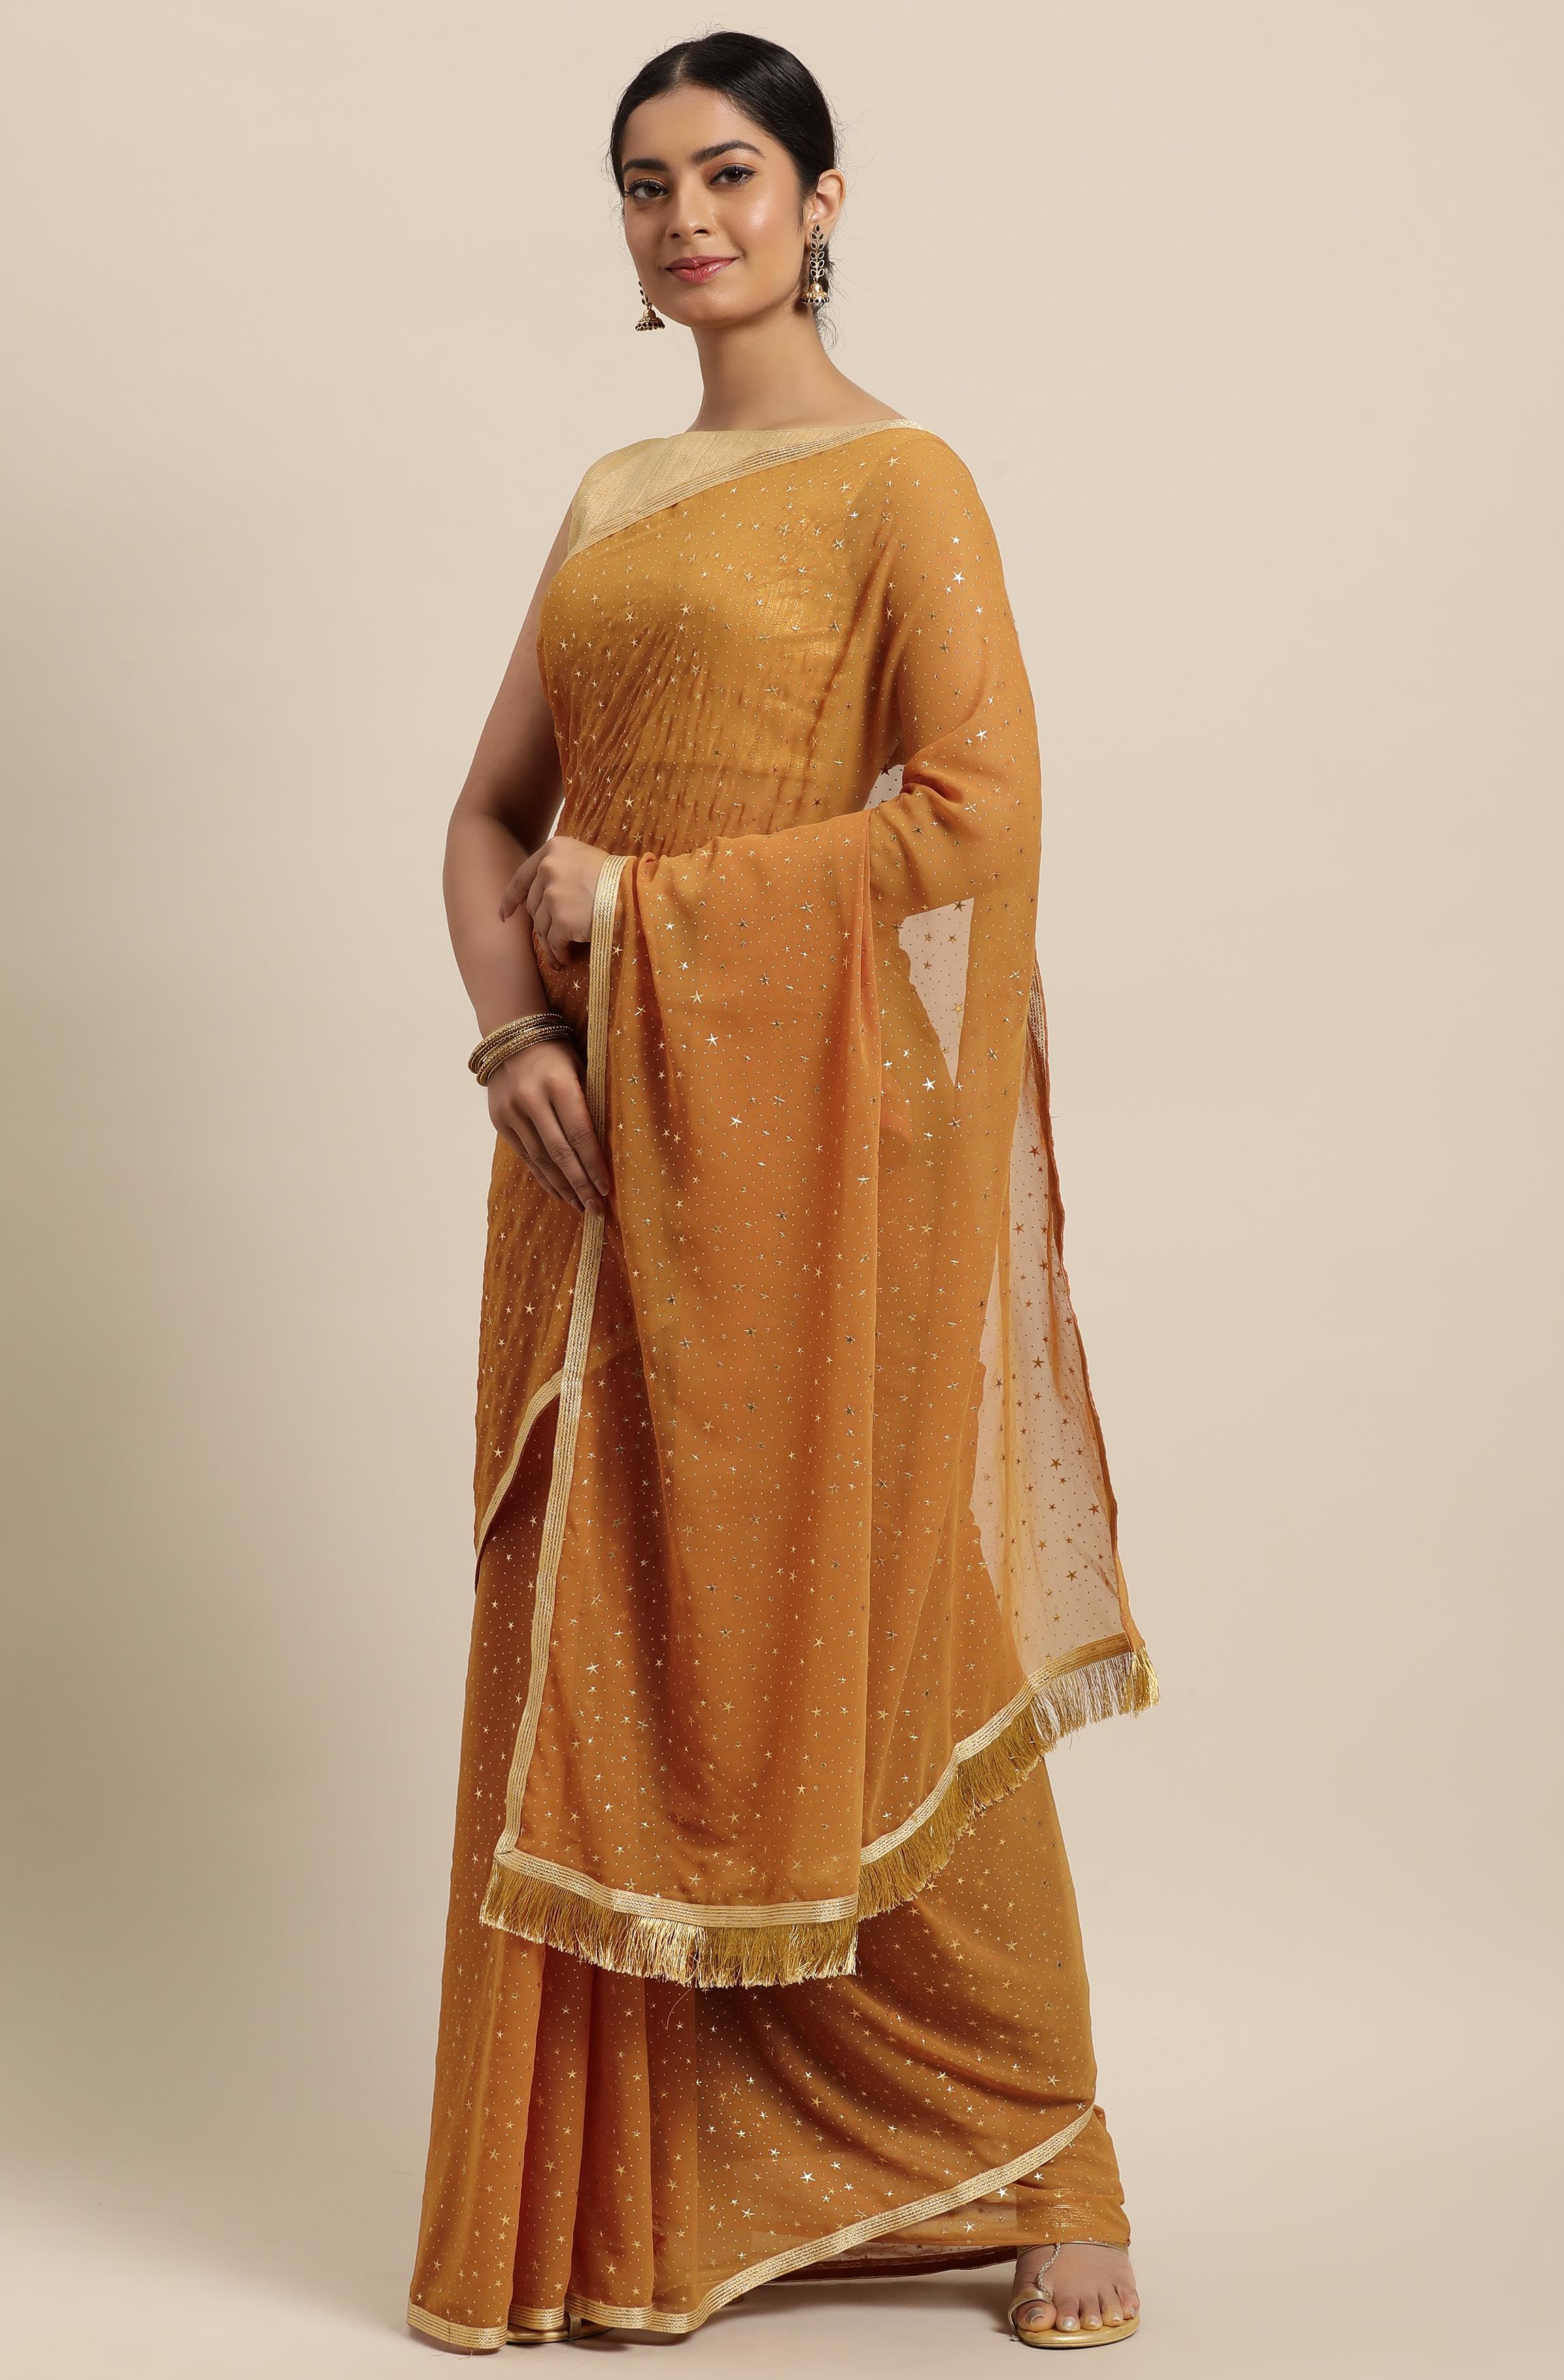 Janasya | Janasya Women's Mustard Poly Georgette Printed Saree With Blouse Piece